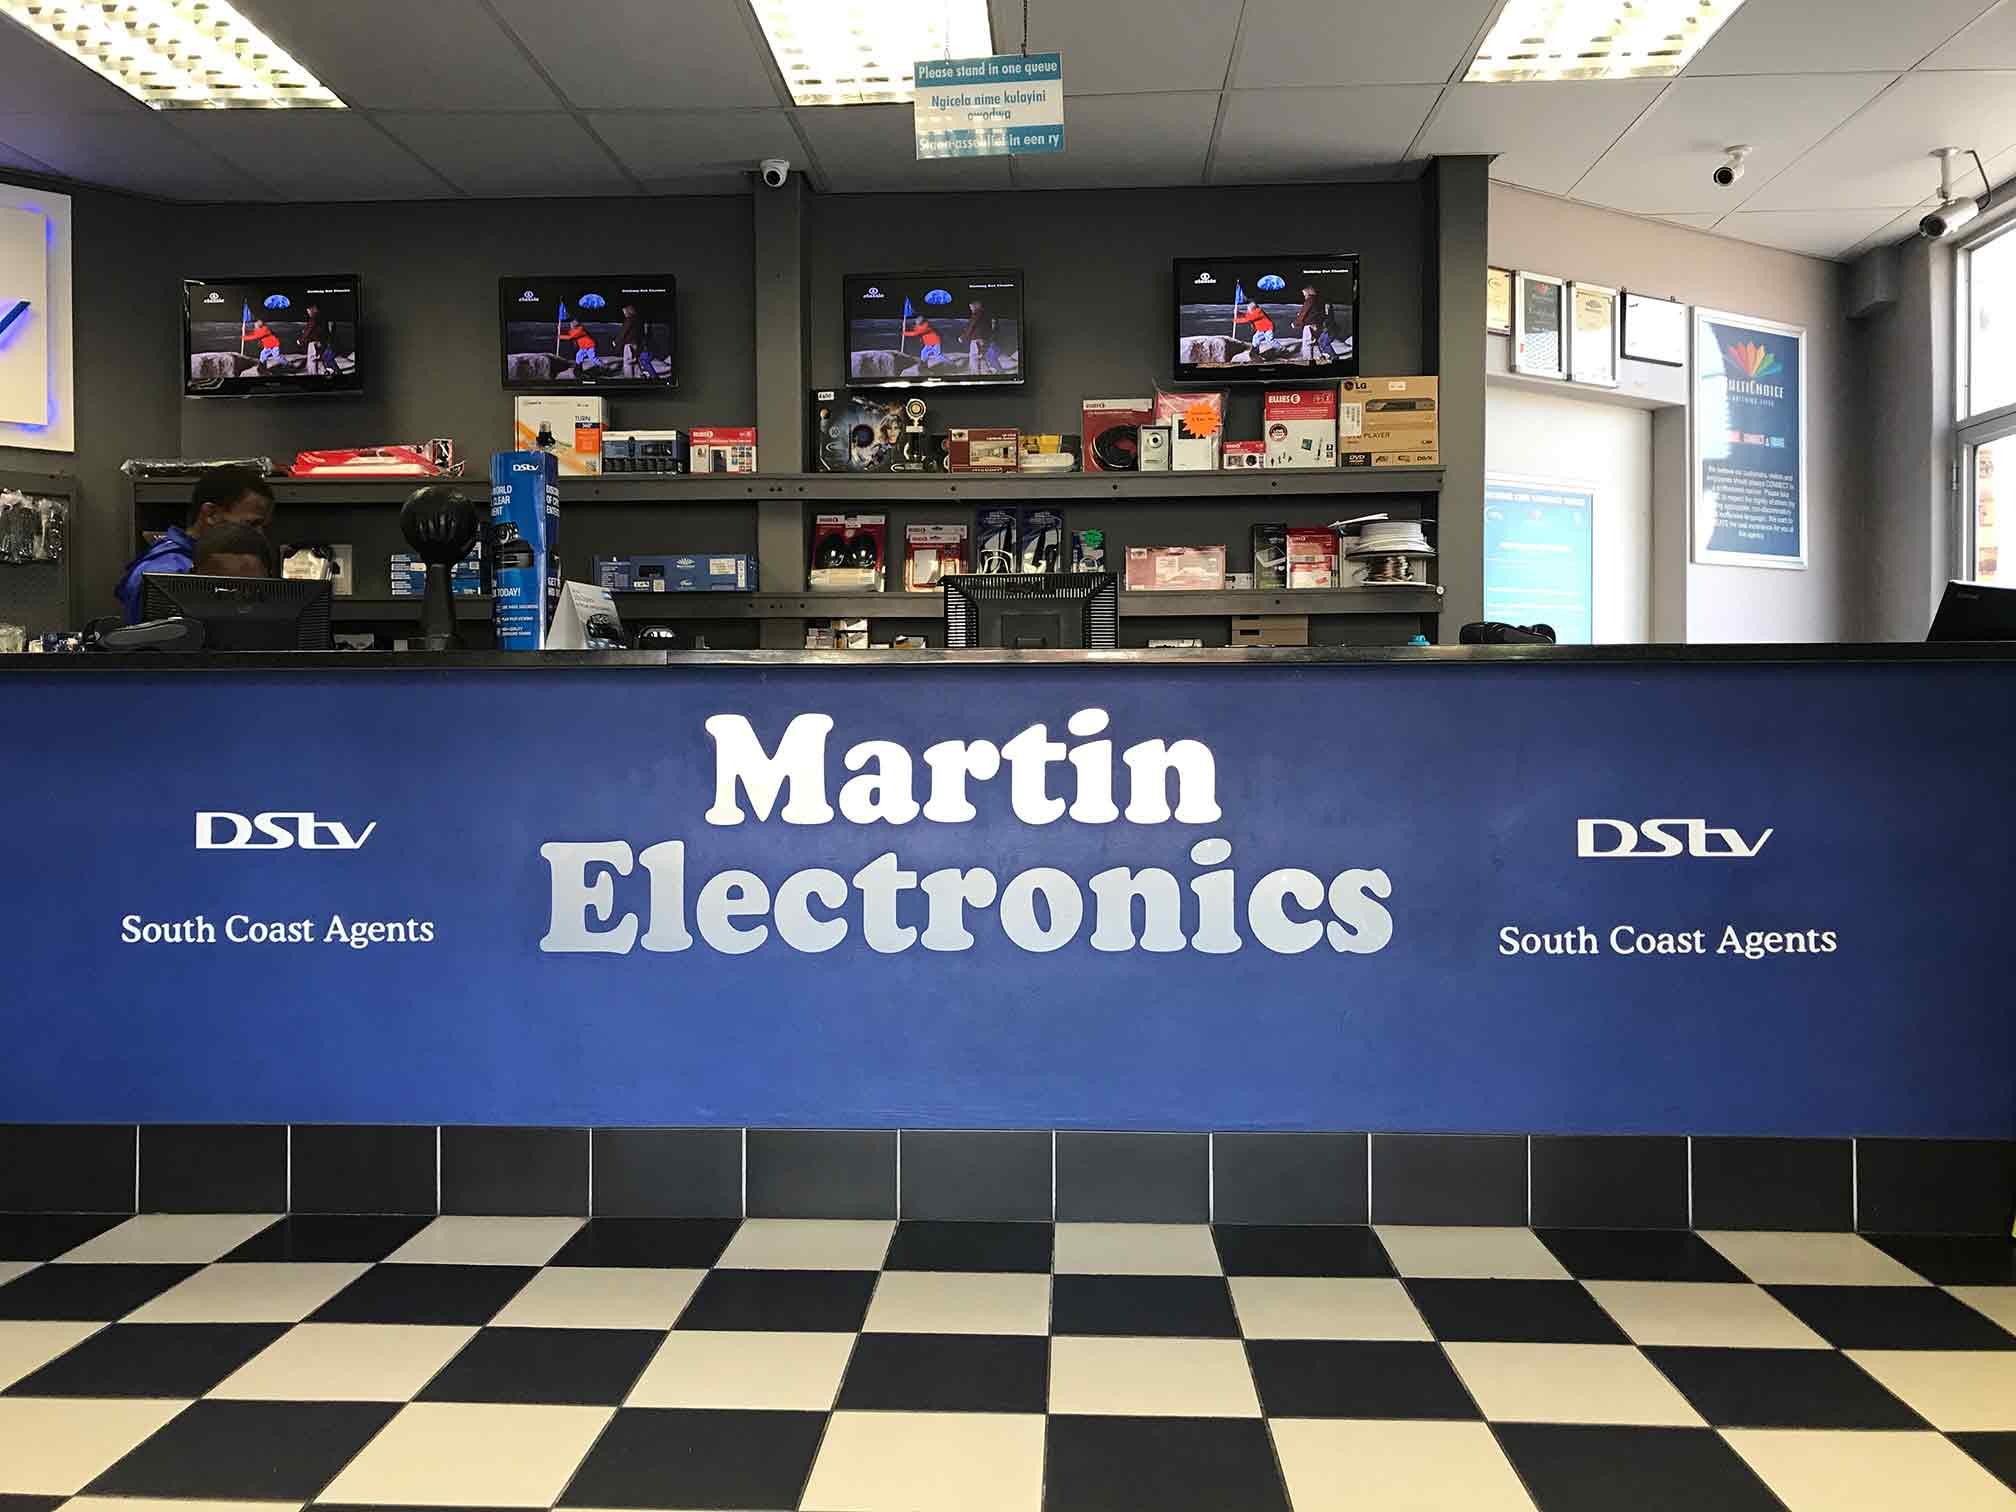 Martin Electronics